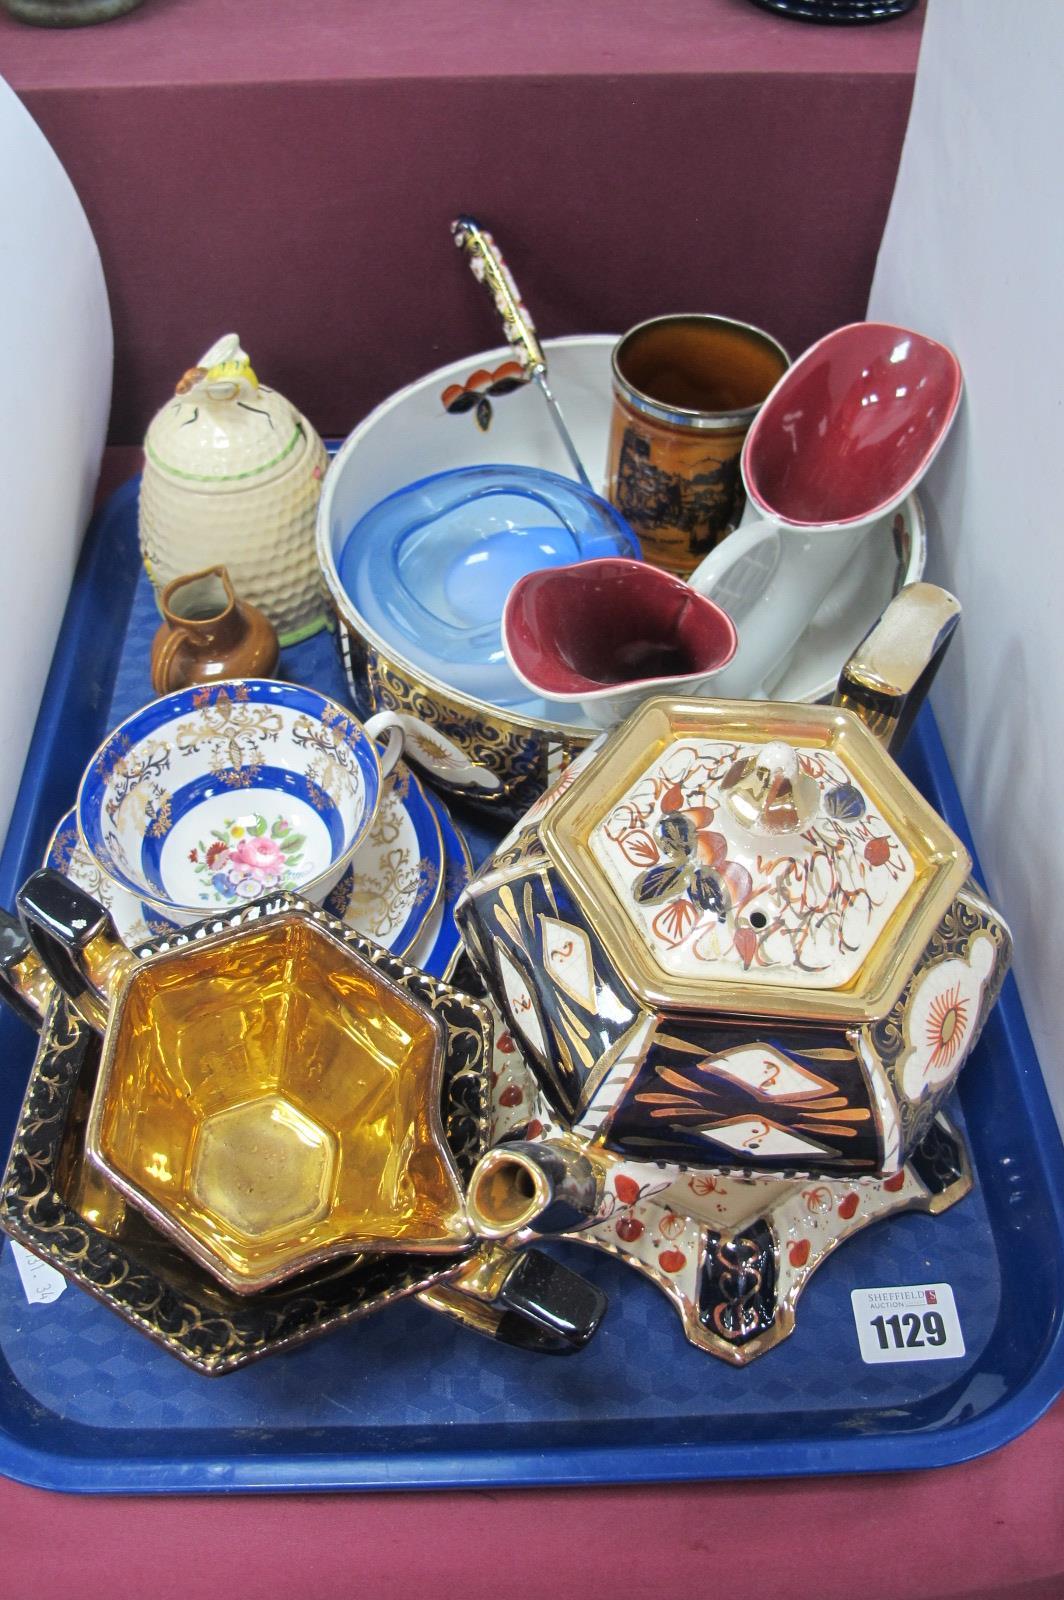 Imari Pottery Tea Service, fruit bowl and paper knife, Grafton trio, etc:- One Tray.